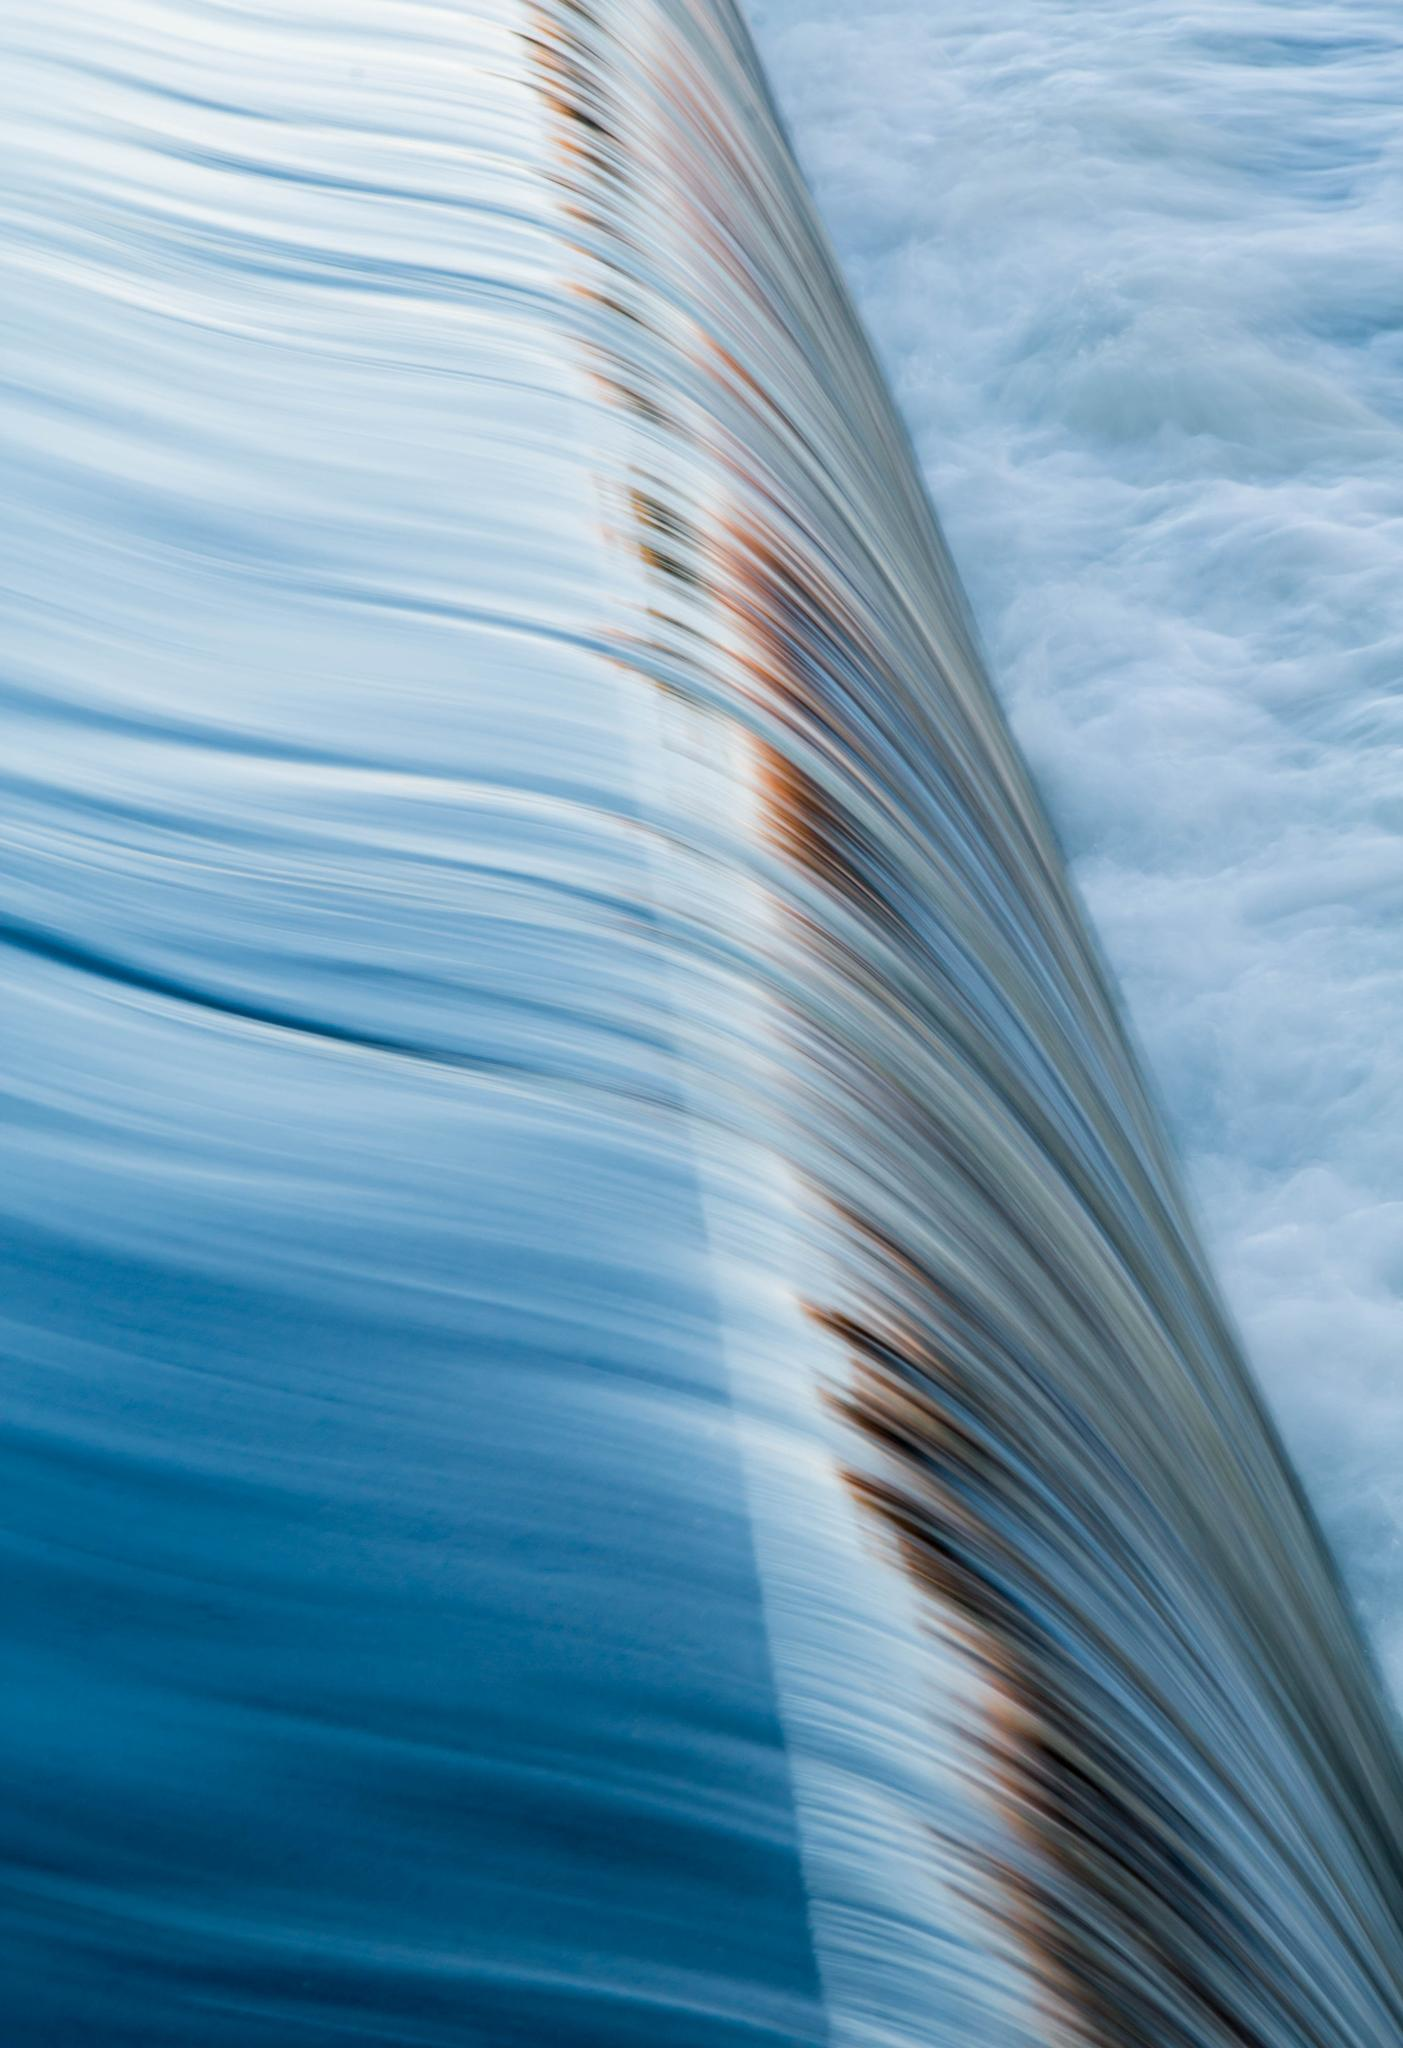 Liquid Slik by Jz Photography